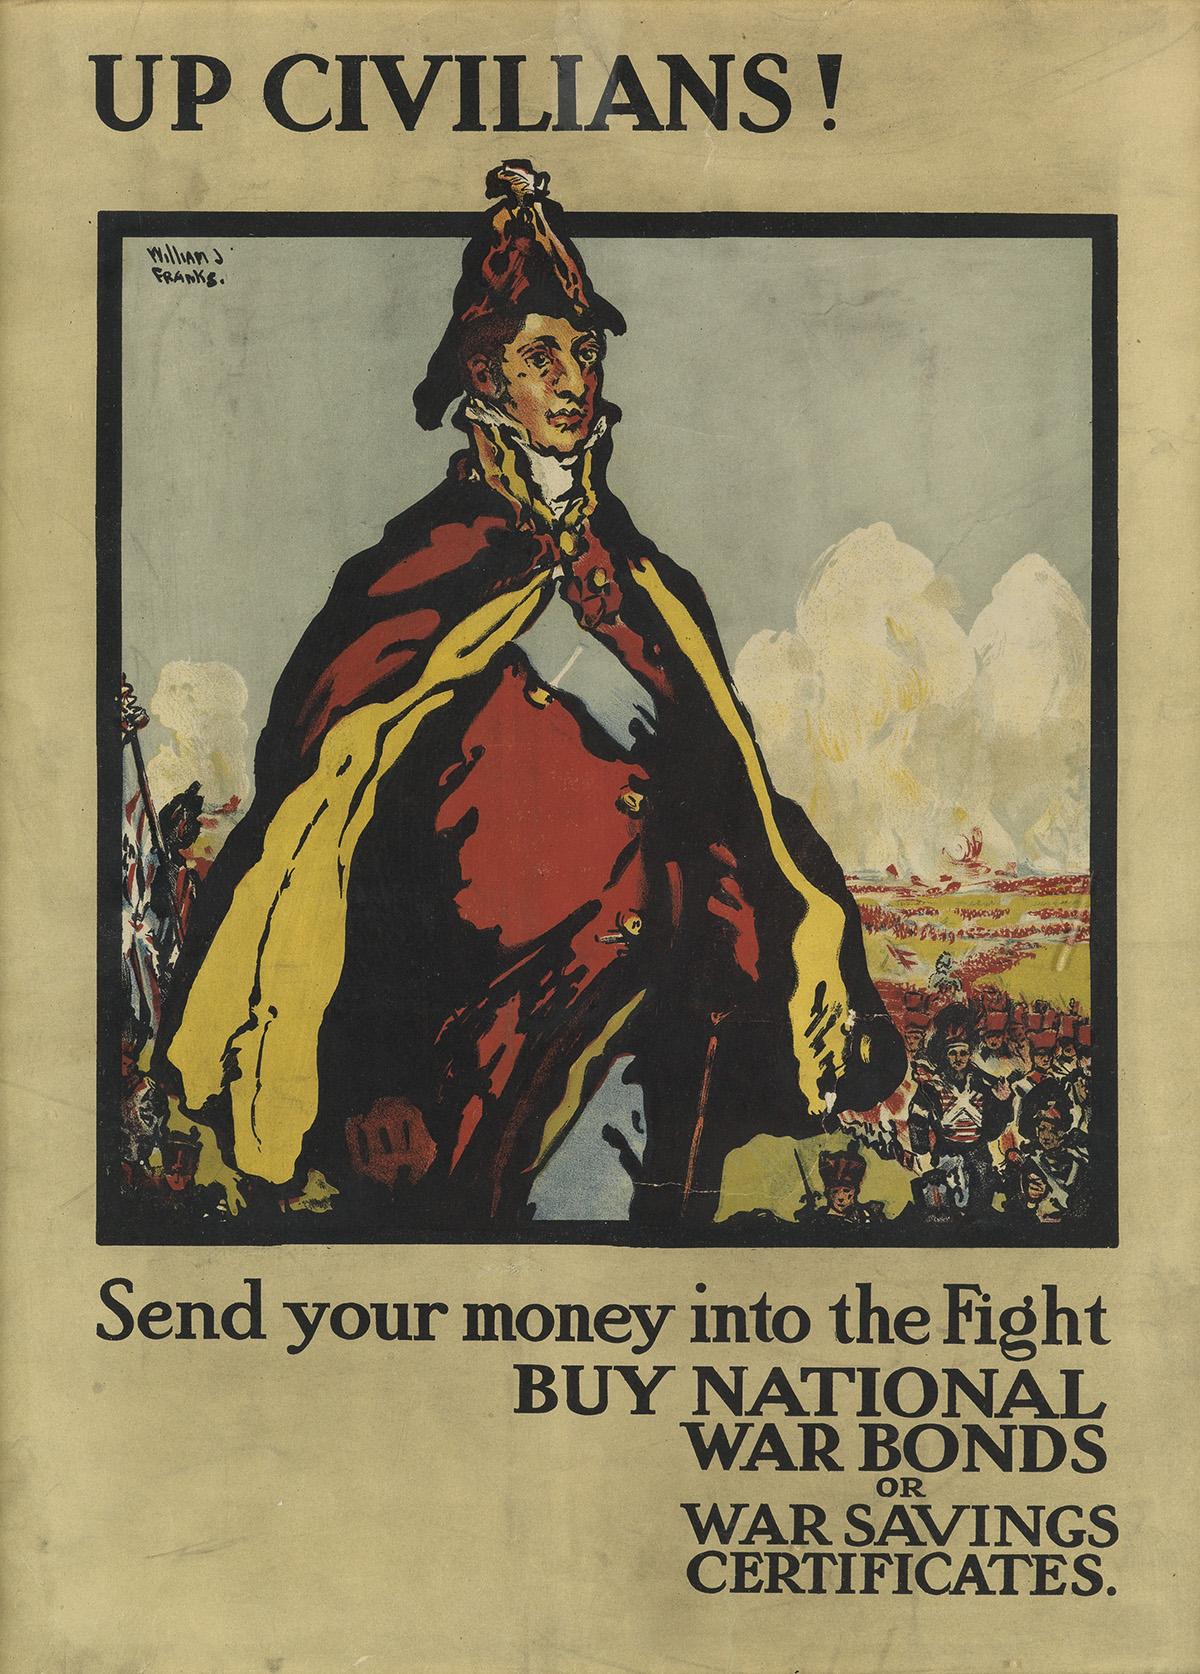 WILLIAM J. FRANKS (DATES UNKNOWN). UP CIVILIANS! / SEND YOUR MONEY INTO THE FIGHT. 1918. 19x14 inches, 50x37 cm. H.&G. Graham Ltd.